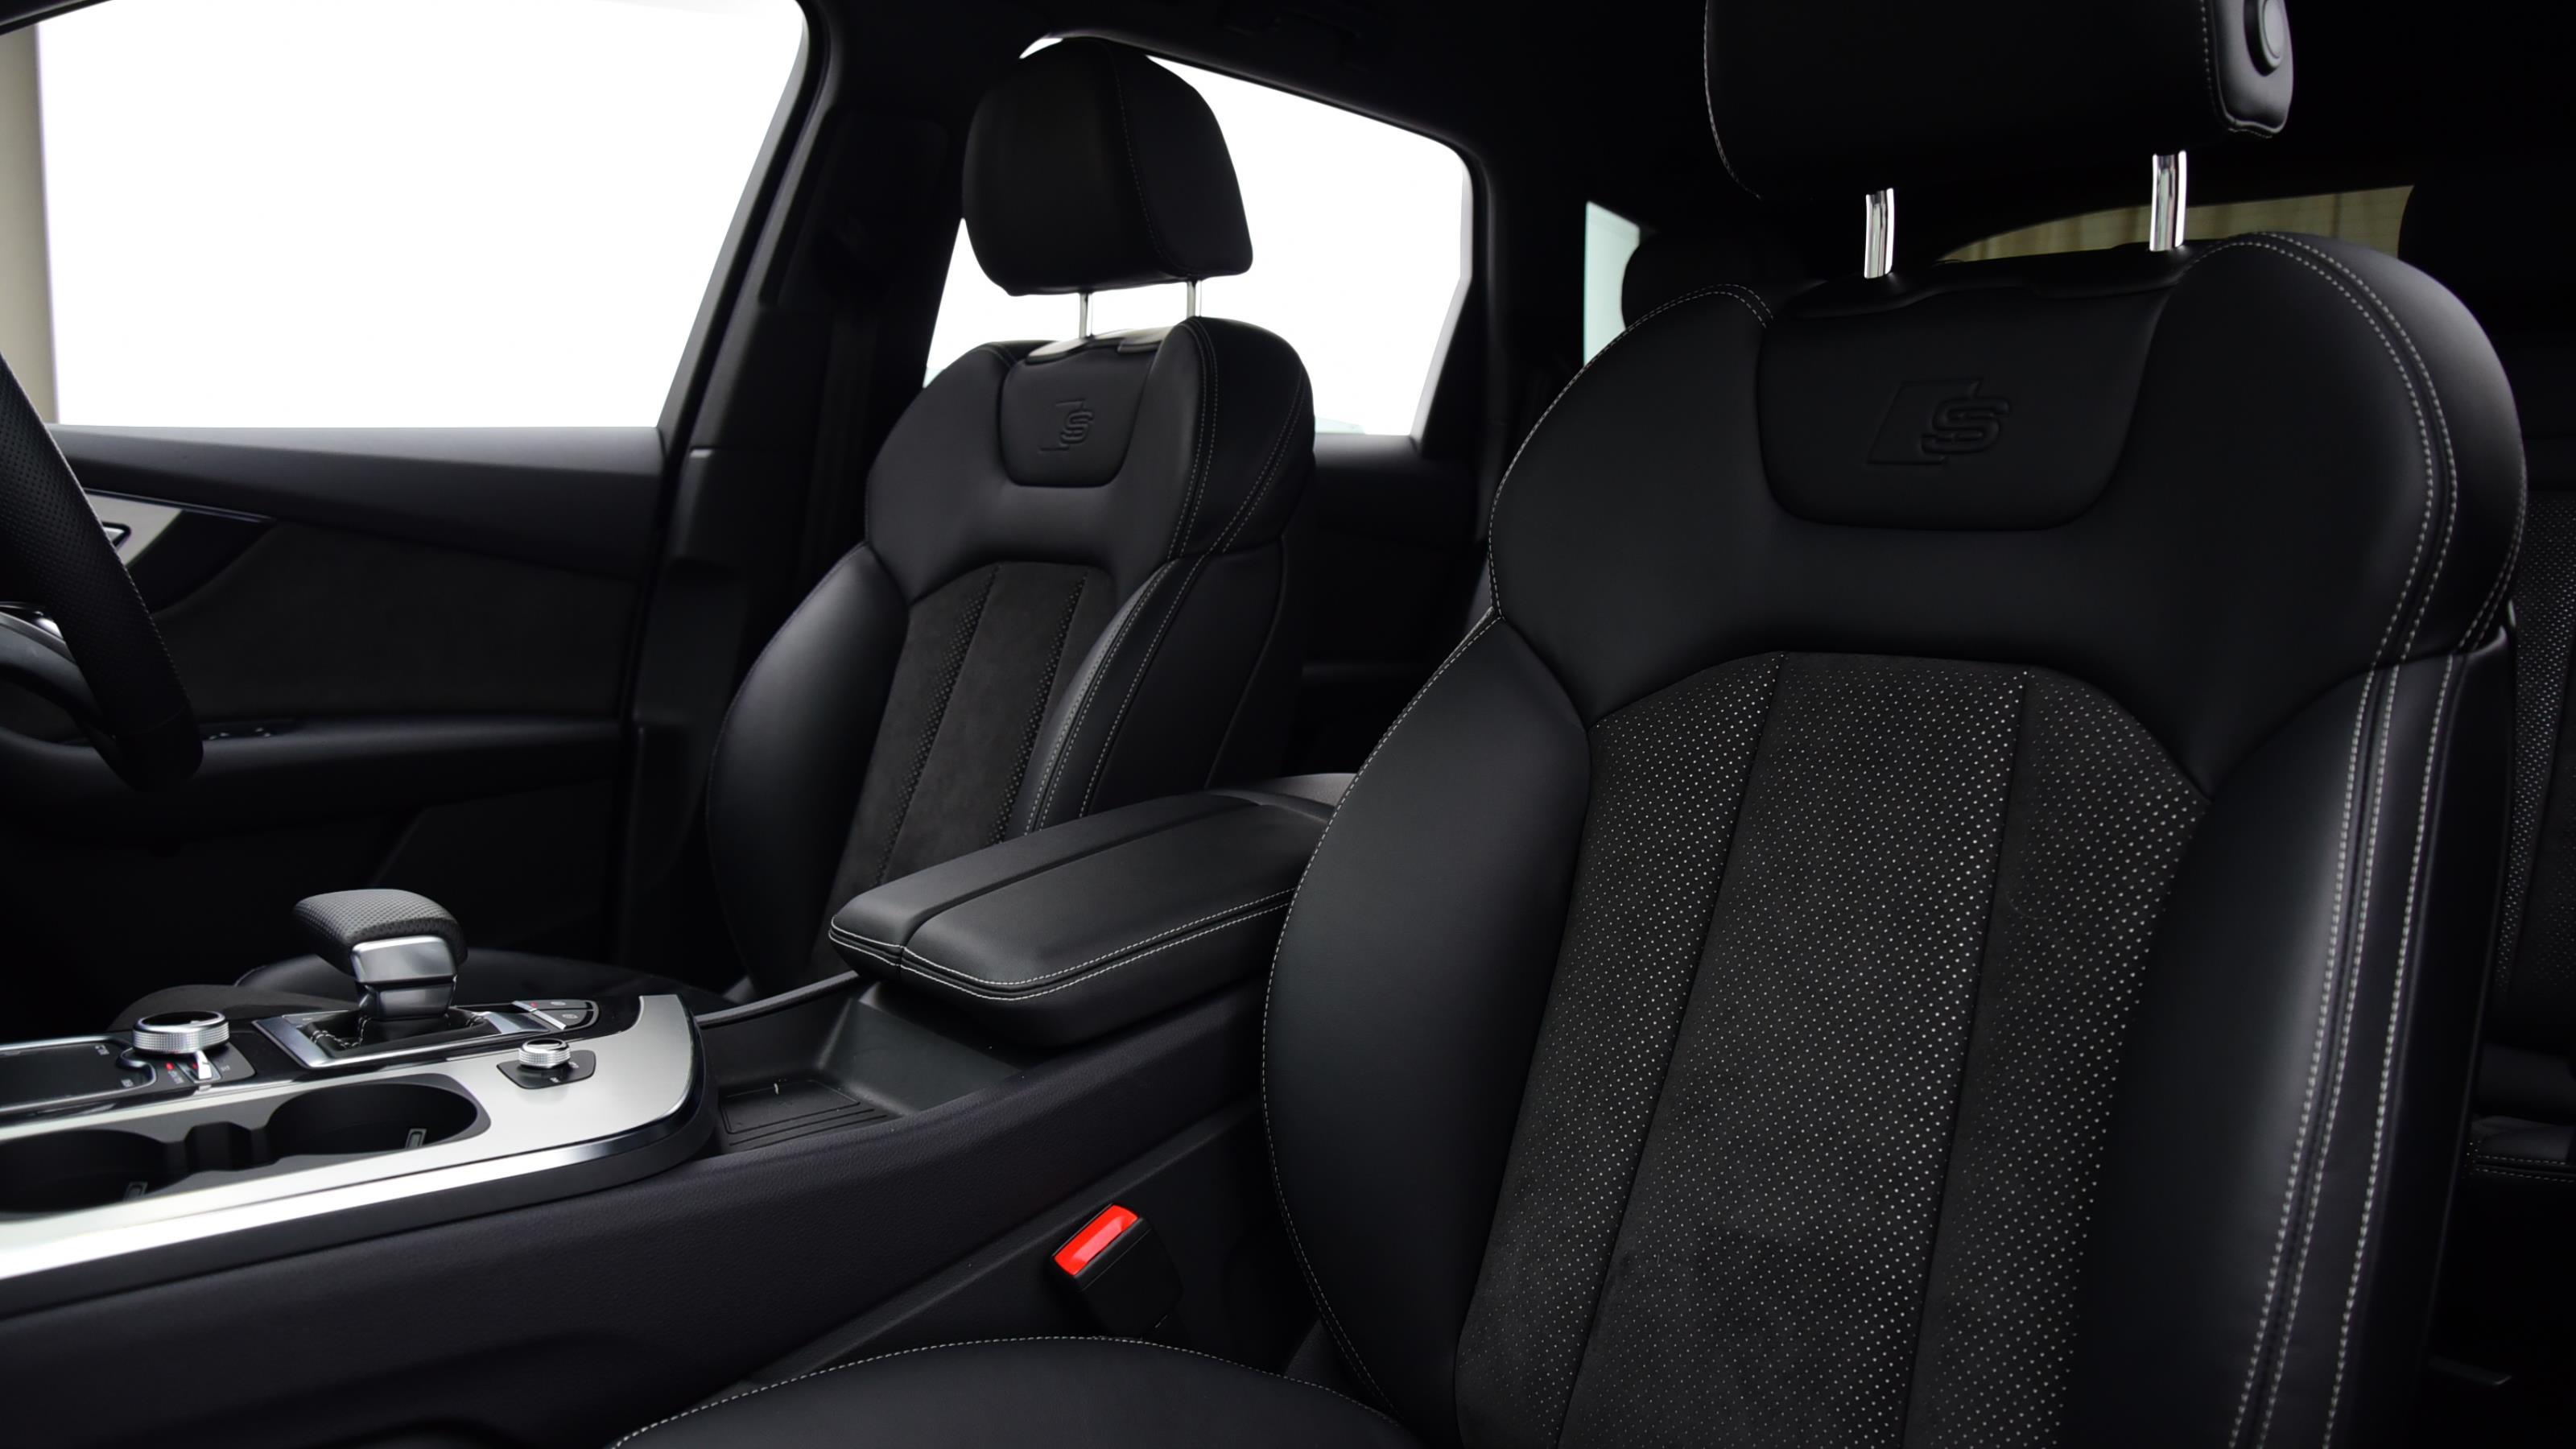 Used 2019 Audi Q7 50 TDI Quattro S Line 5dr Tiptronic WHITE at Saxton4x4